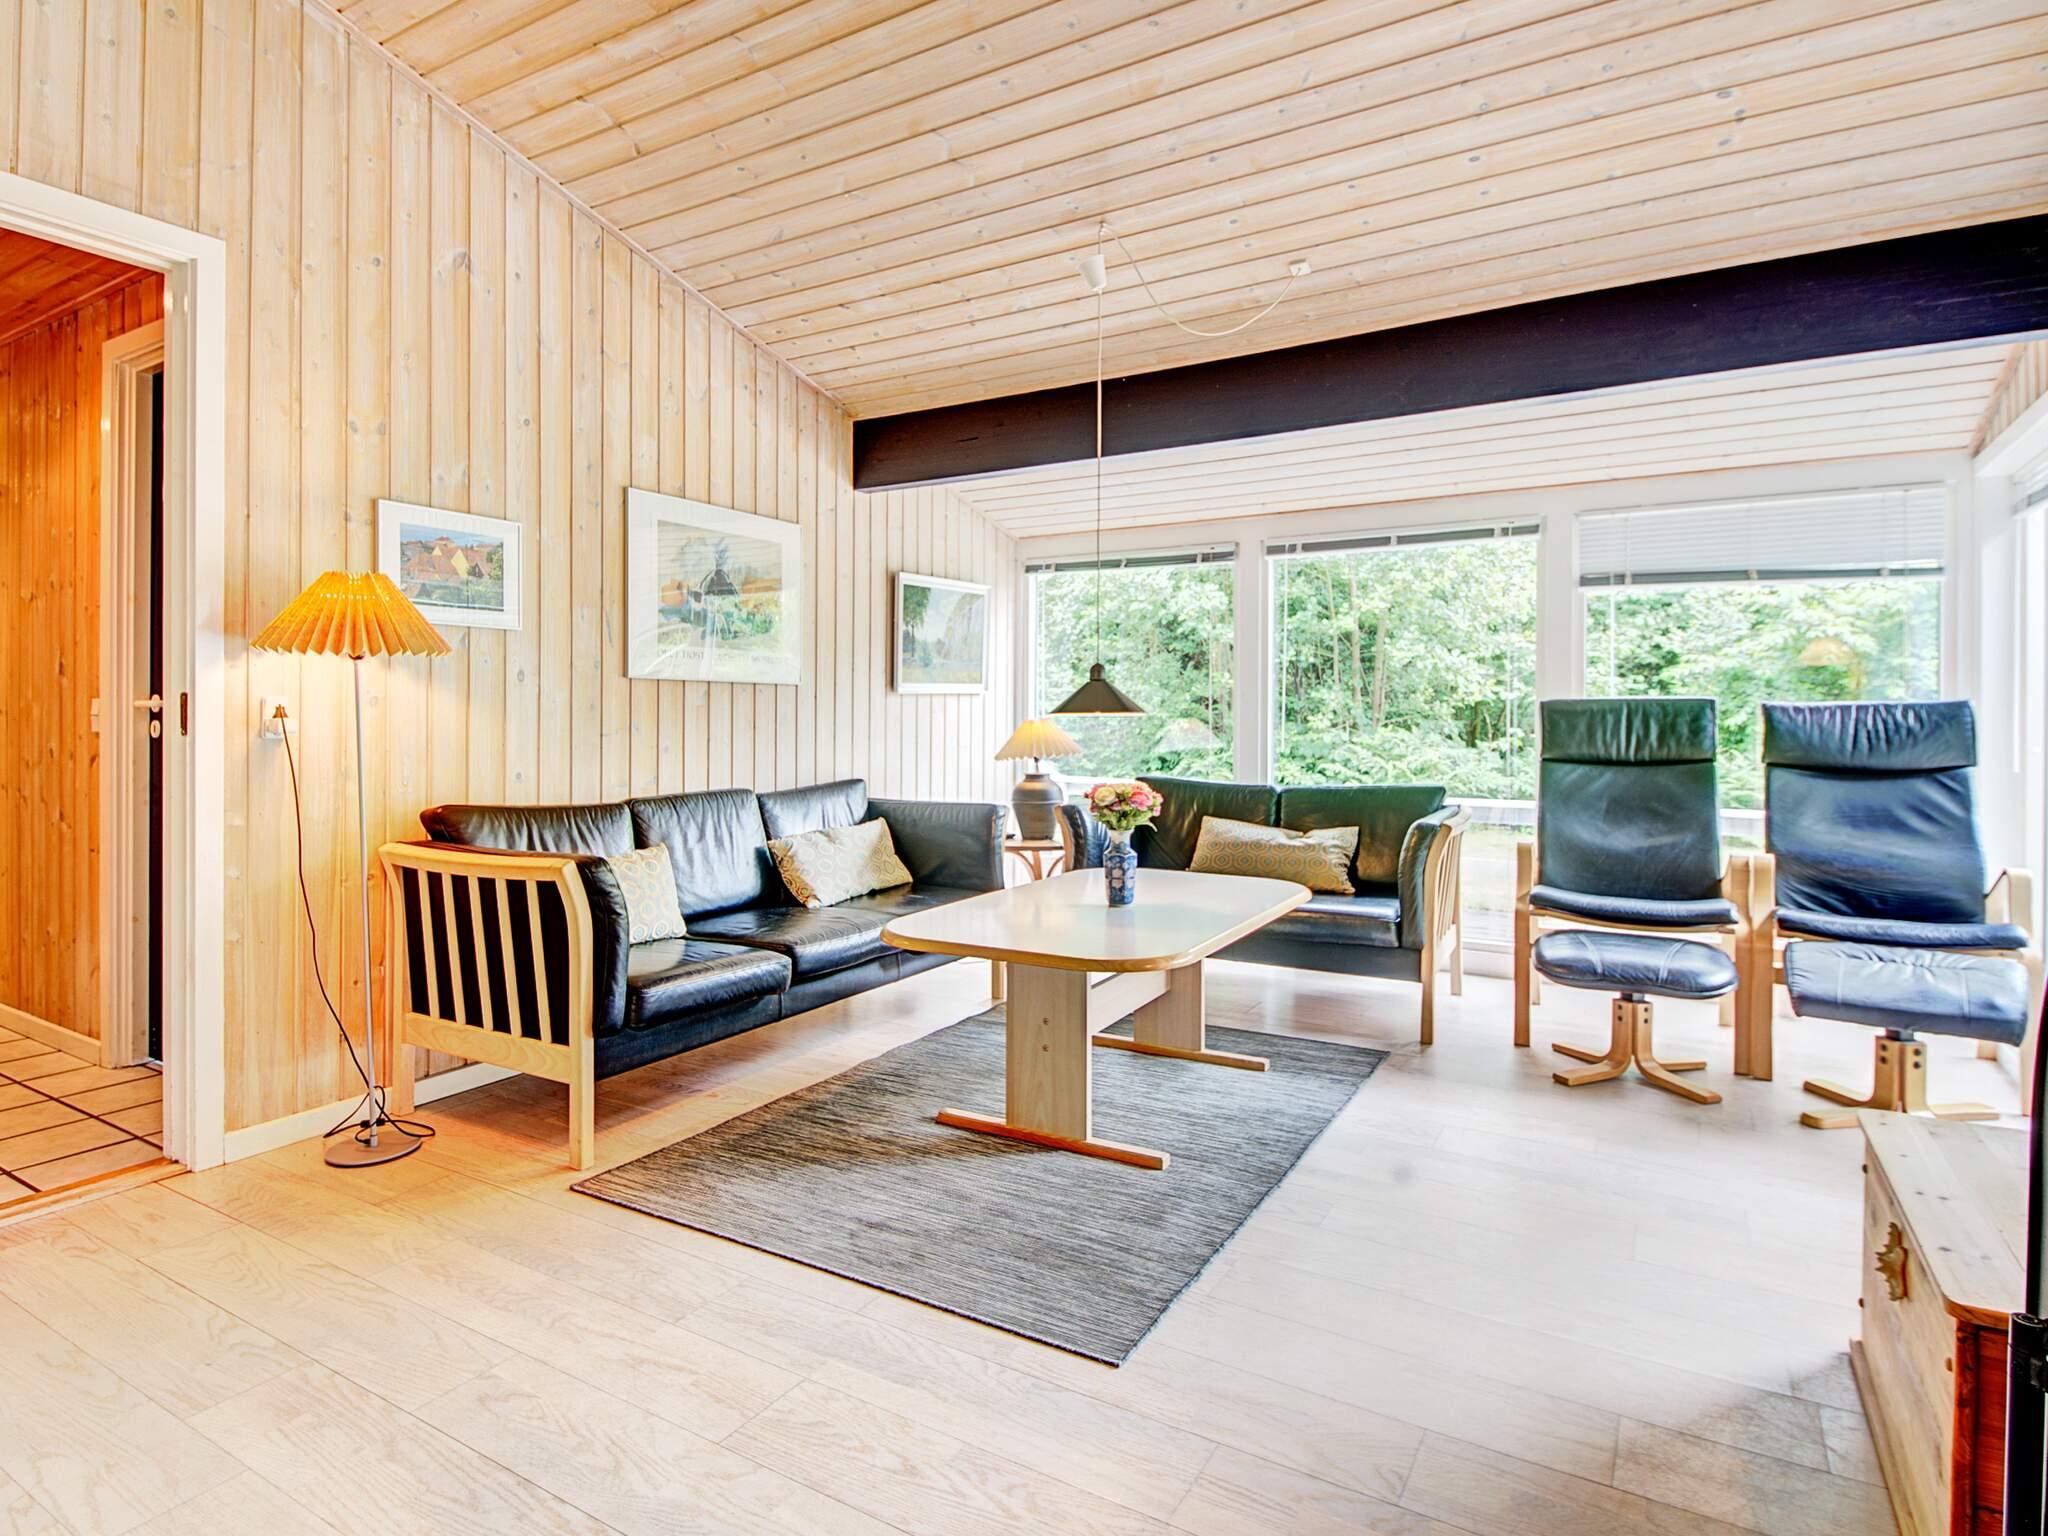 Maison de vacances Østre Sømarken (82551), Aakirkeby, , Bornholm, Danemark, image 4